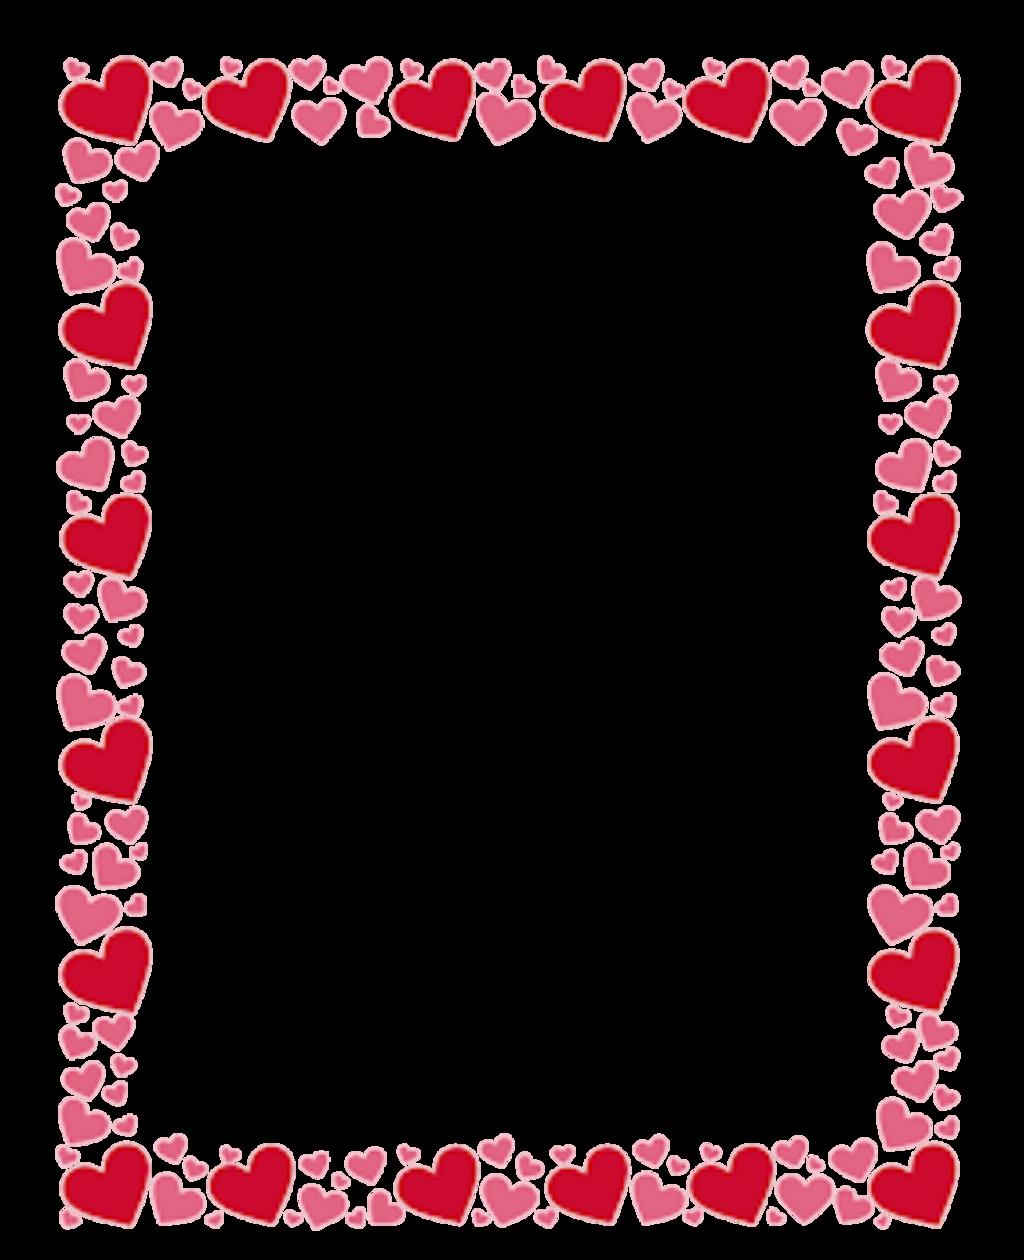 frames frame borders border hearts heart love